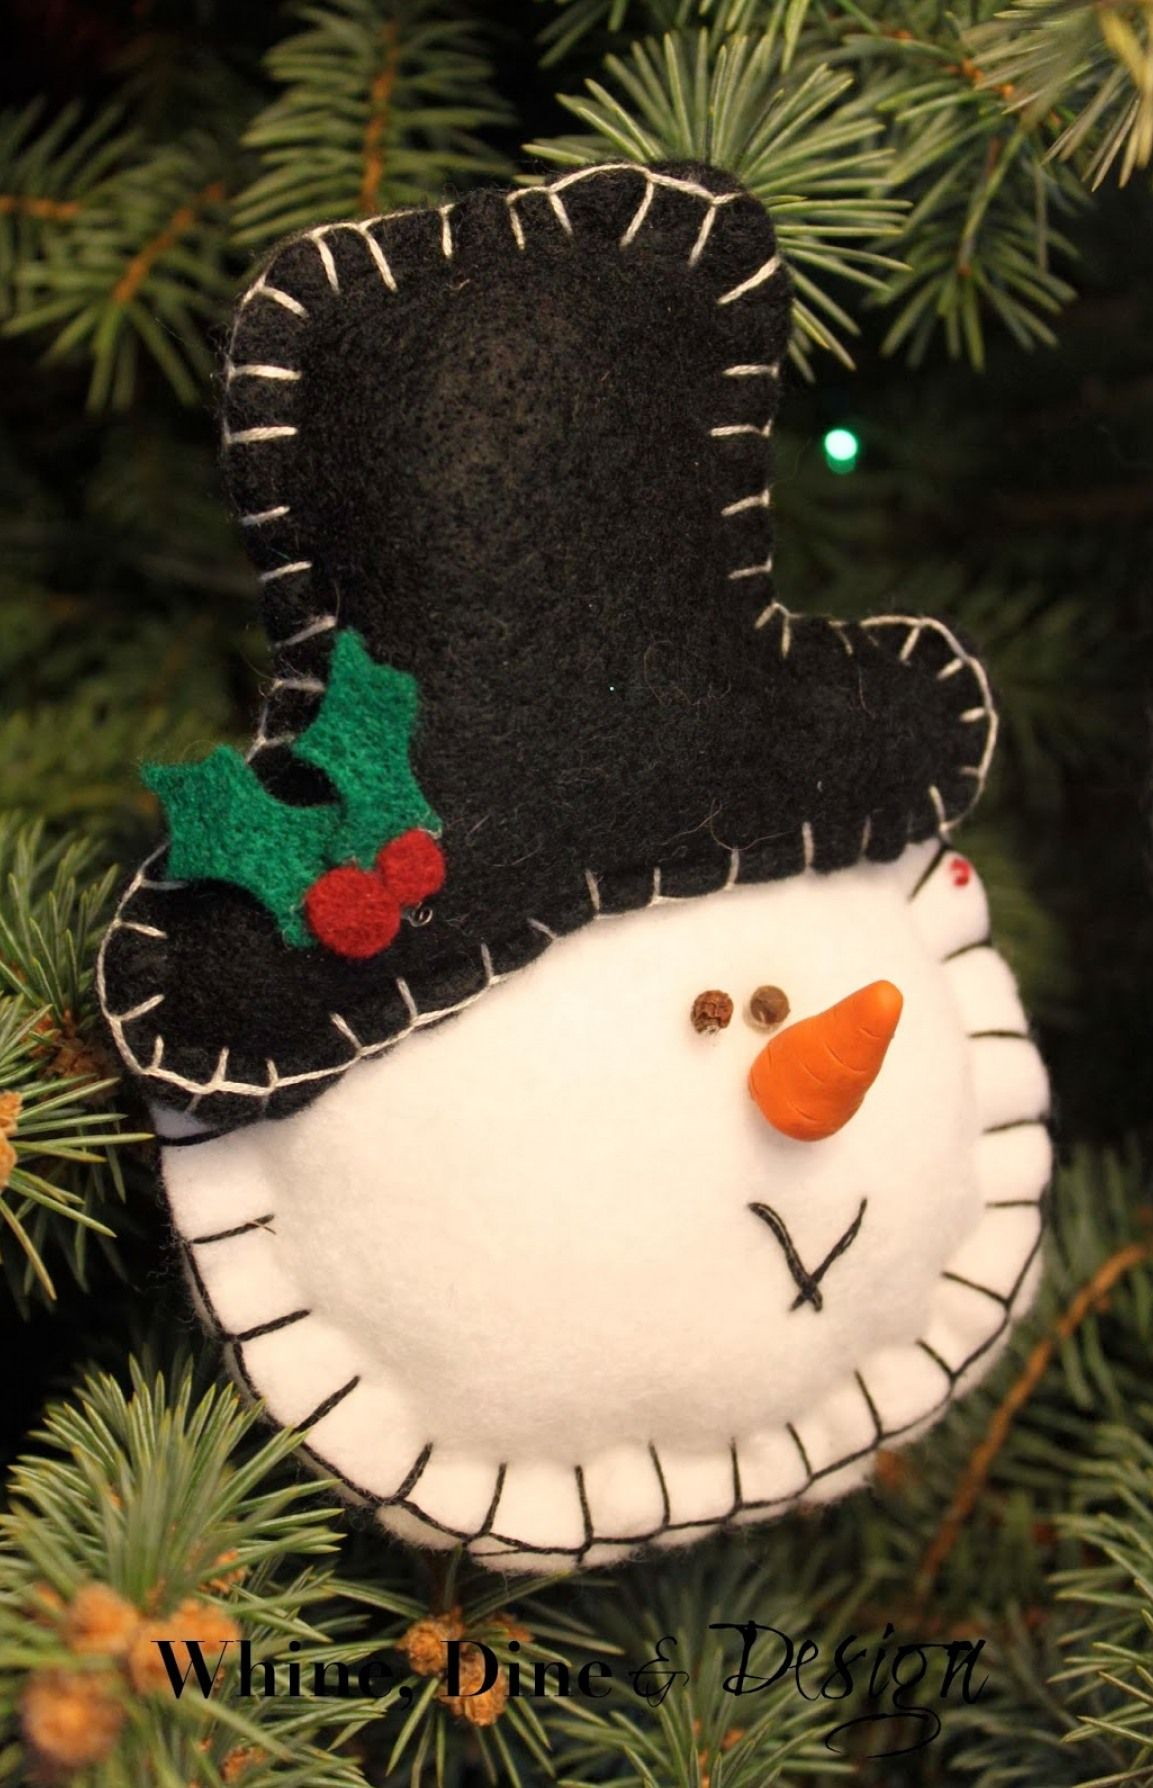 Christmas Felt Decorations Felt Crafts Christmas Felt Christmas Ornaments Christmas Ornaments To Make